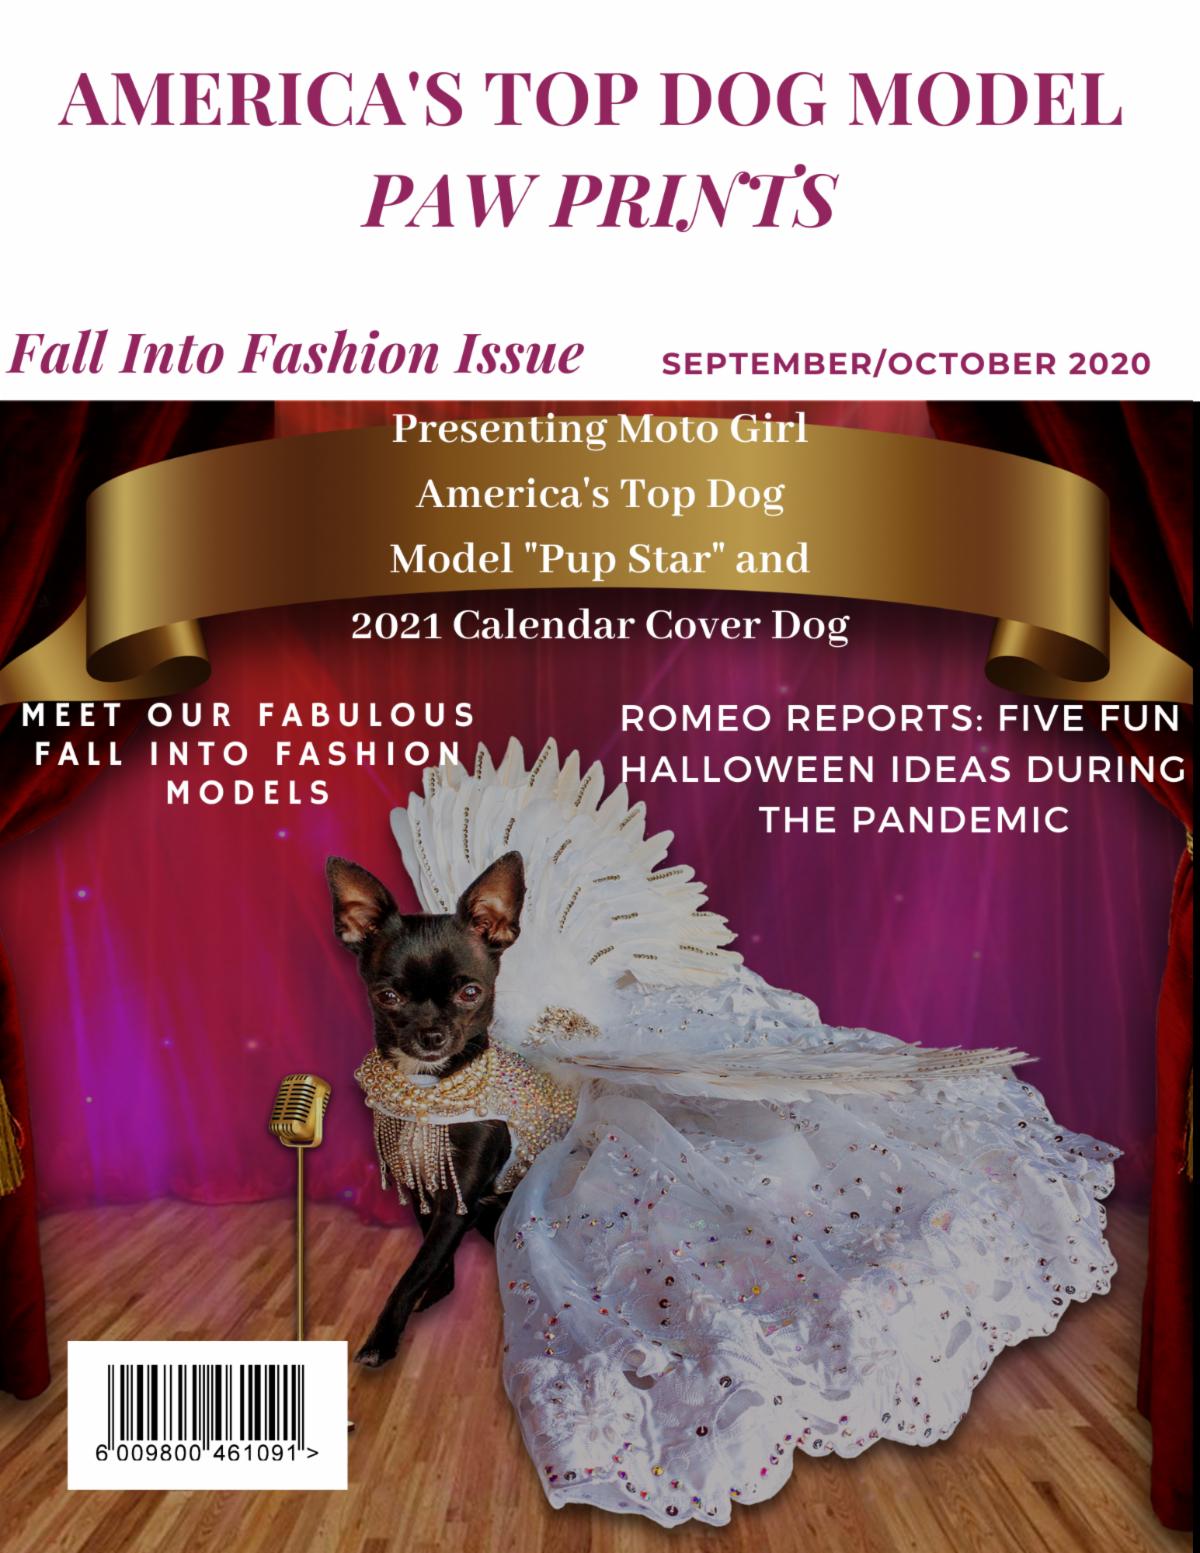 Fall Into Fashion 2020